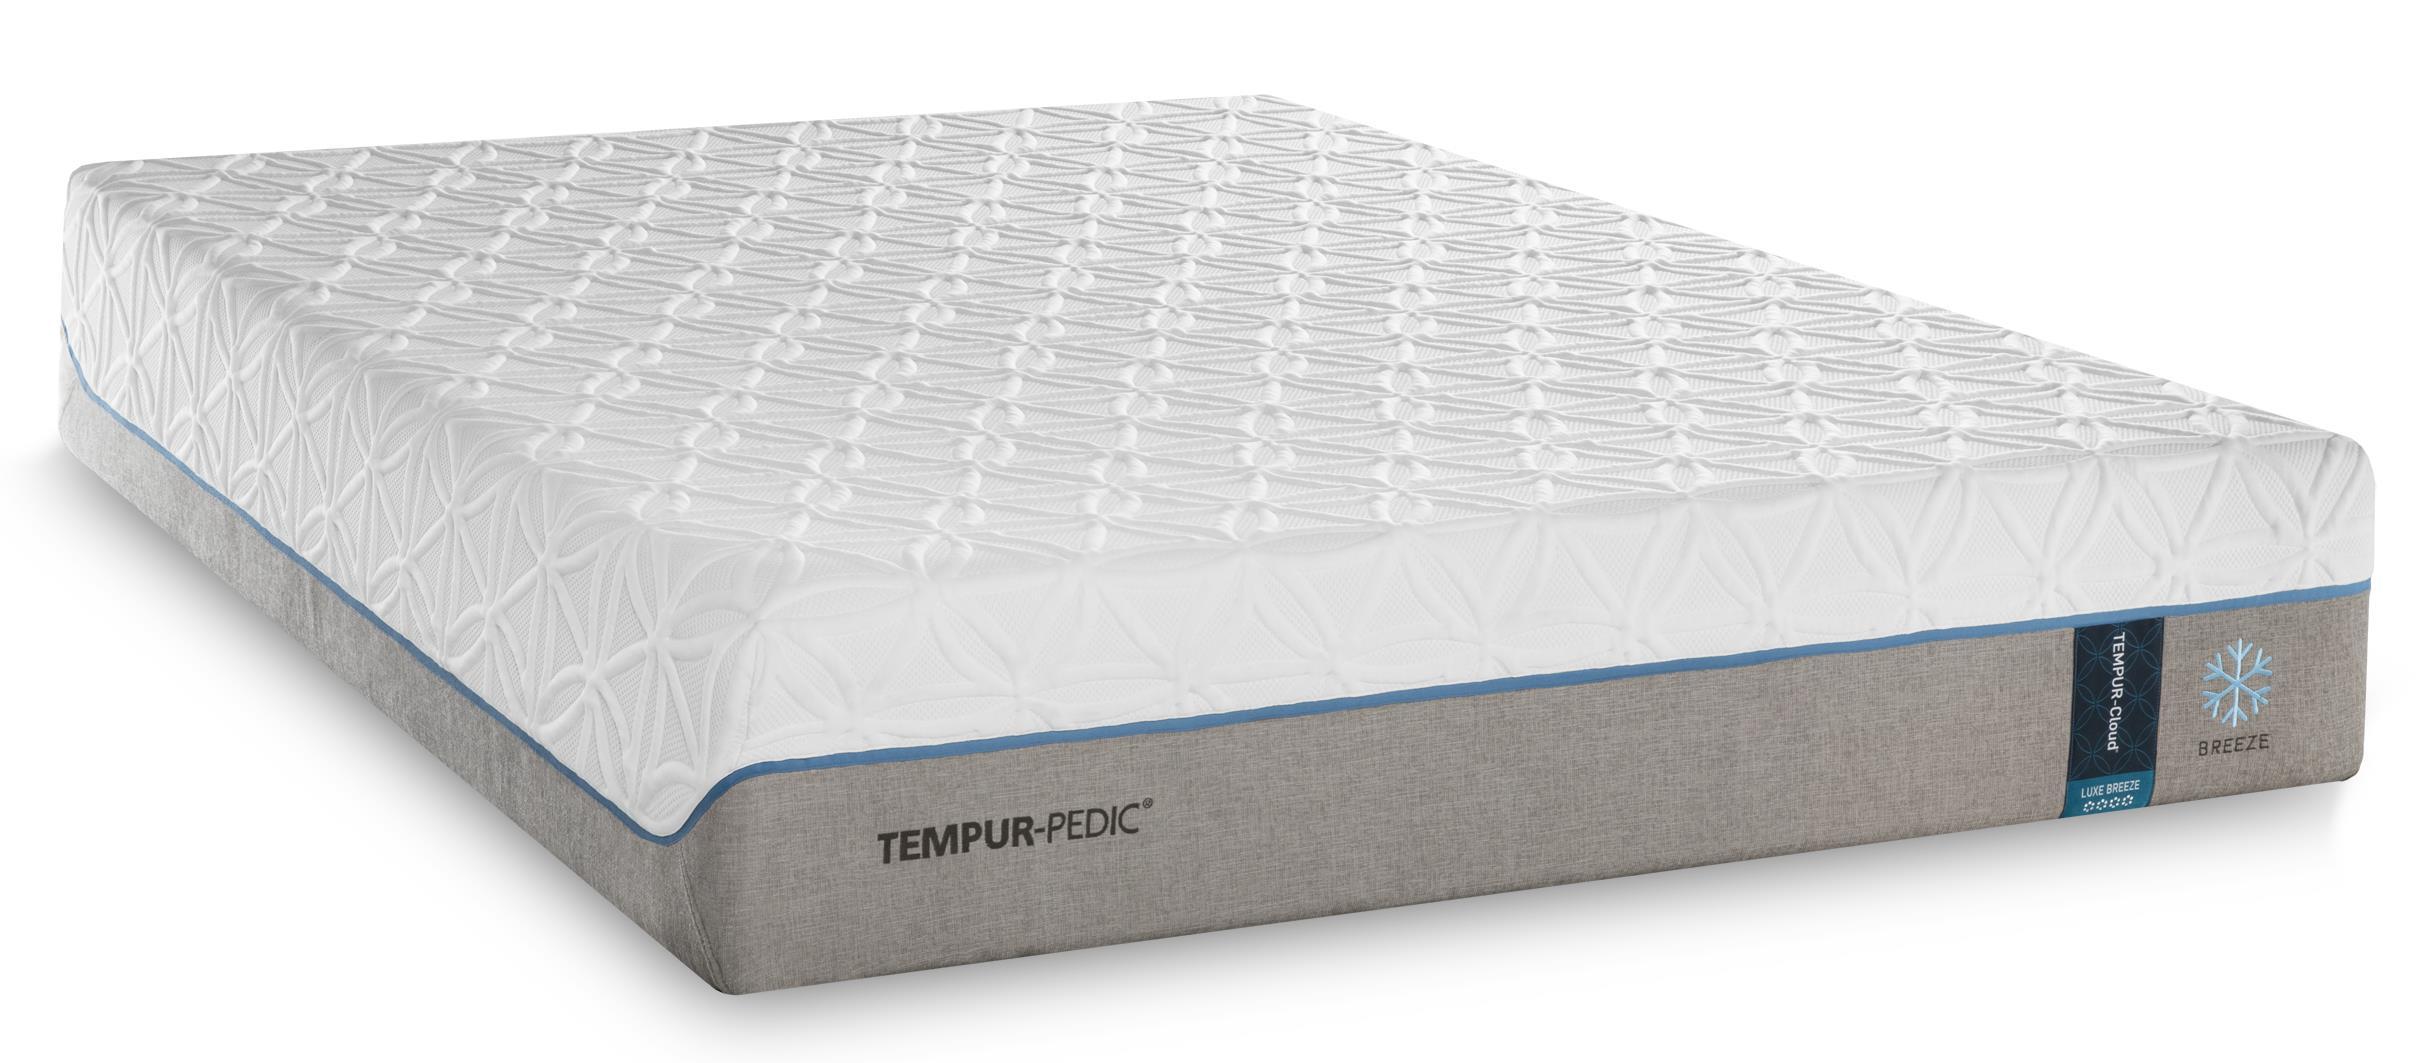 Tempur-Pedic® TEMPUR-Cloud Luxe Breeze 2 King Ultra Soft Adjustable Set - Item Number: 10109270+2x25287120